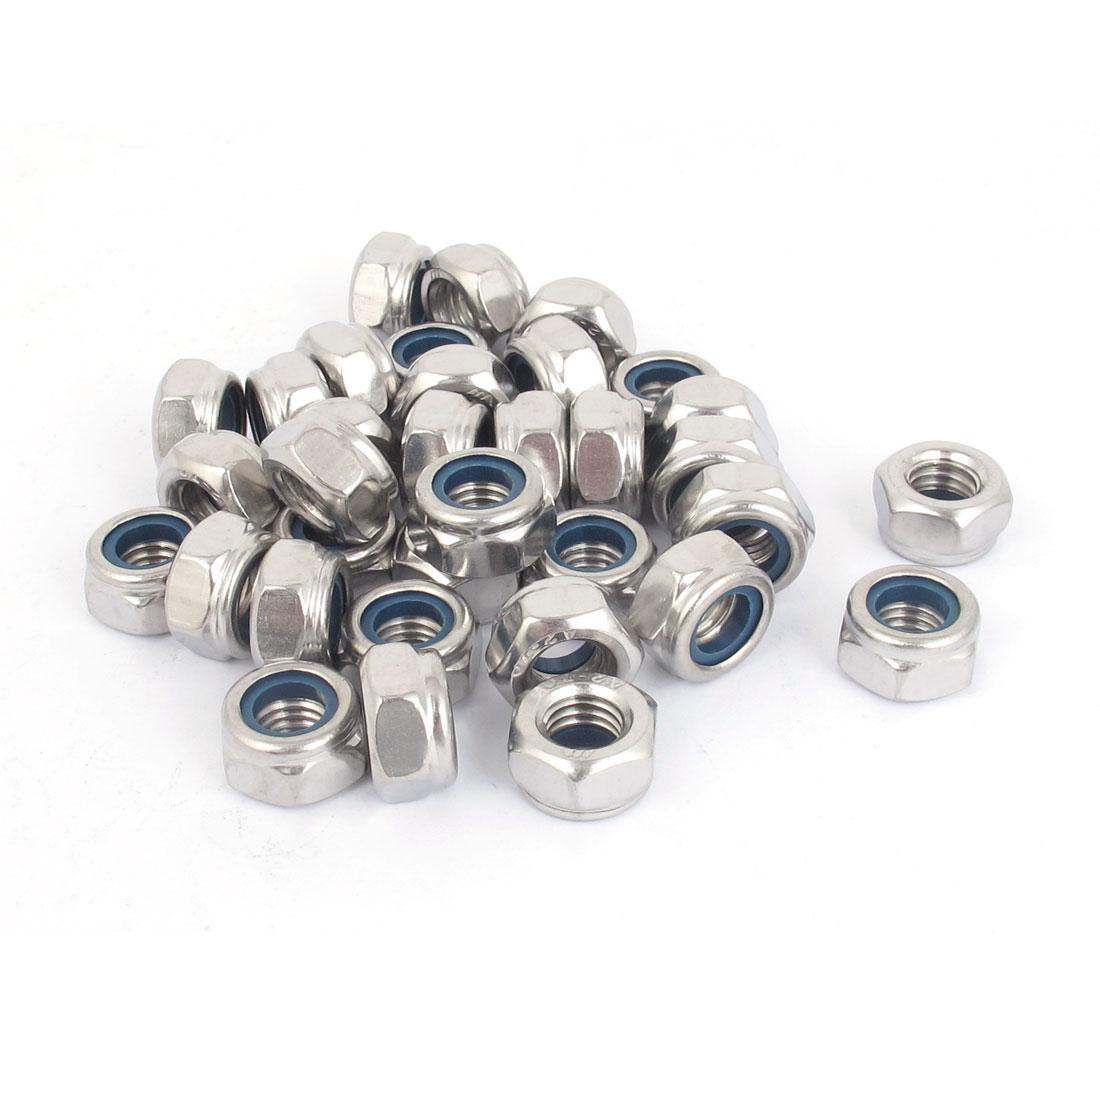 M10x1.5mm 304 Stainless Steel Self-Locking Nylon Insert Hex Lock Nuts 50pcs